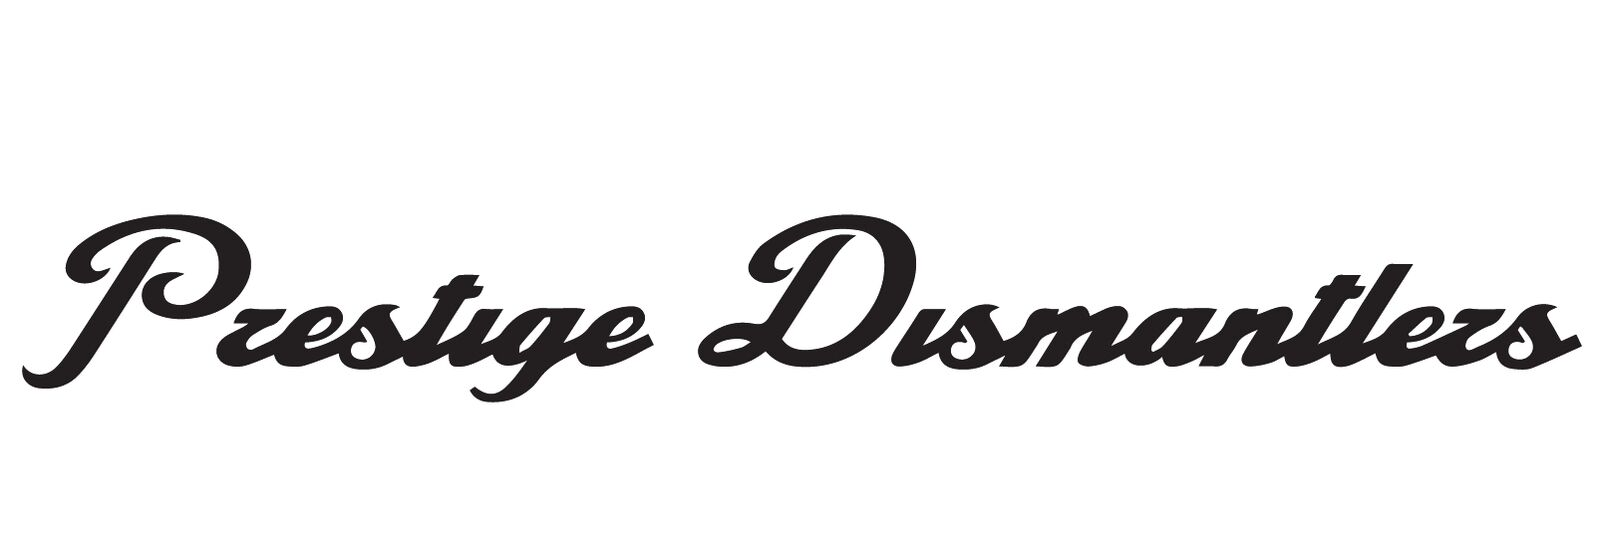 prestige-dismantlers